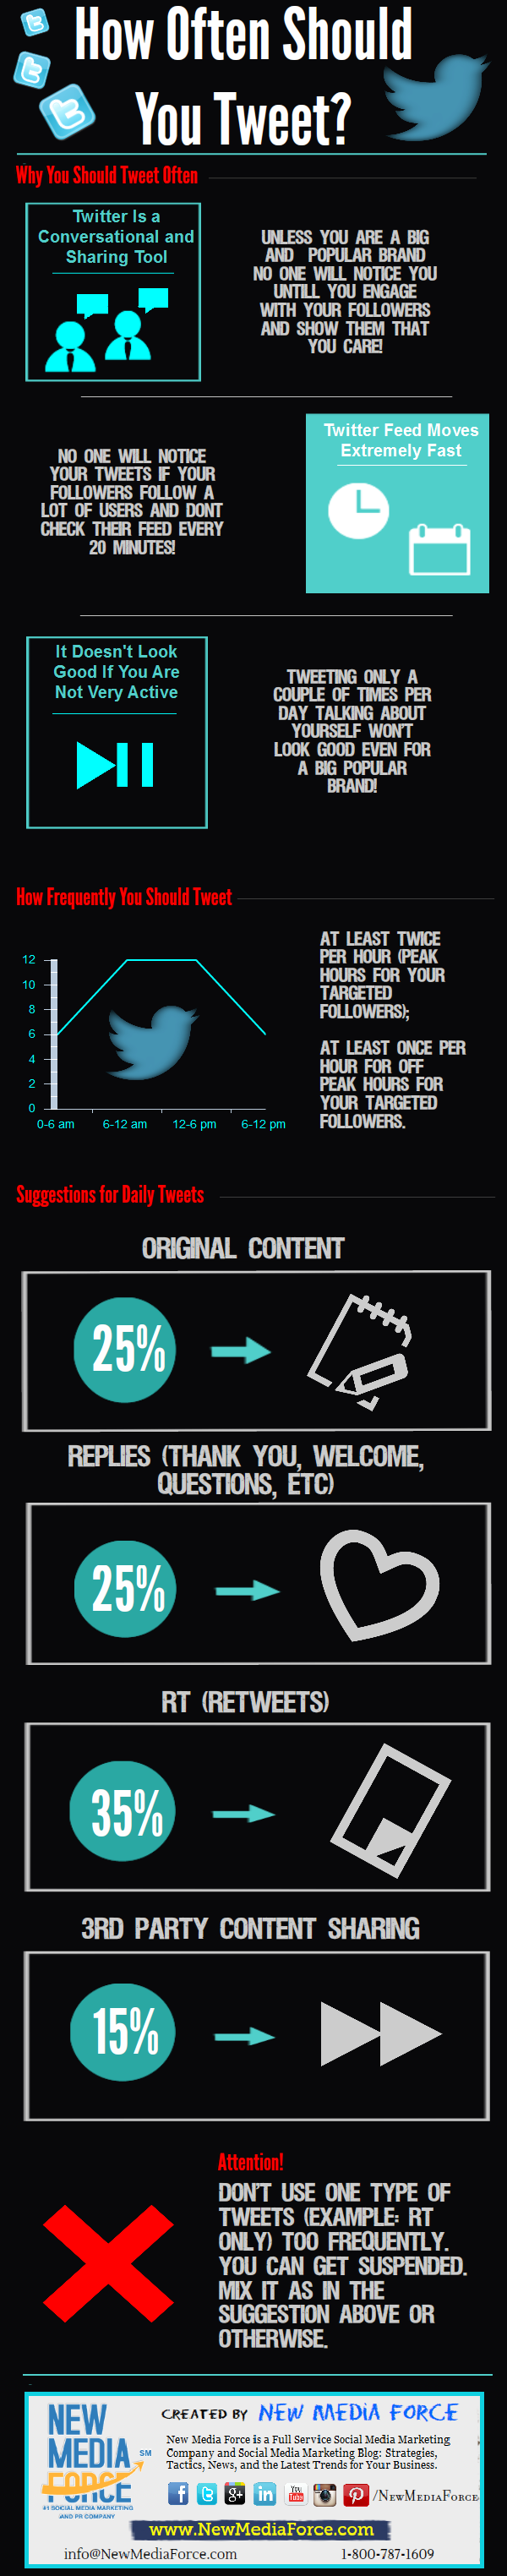 infografia_cuan_a_menudoi_tuitear